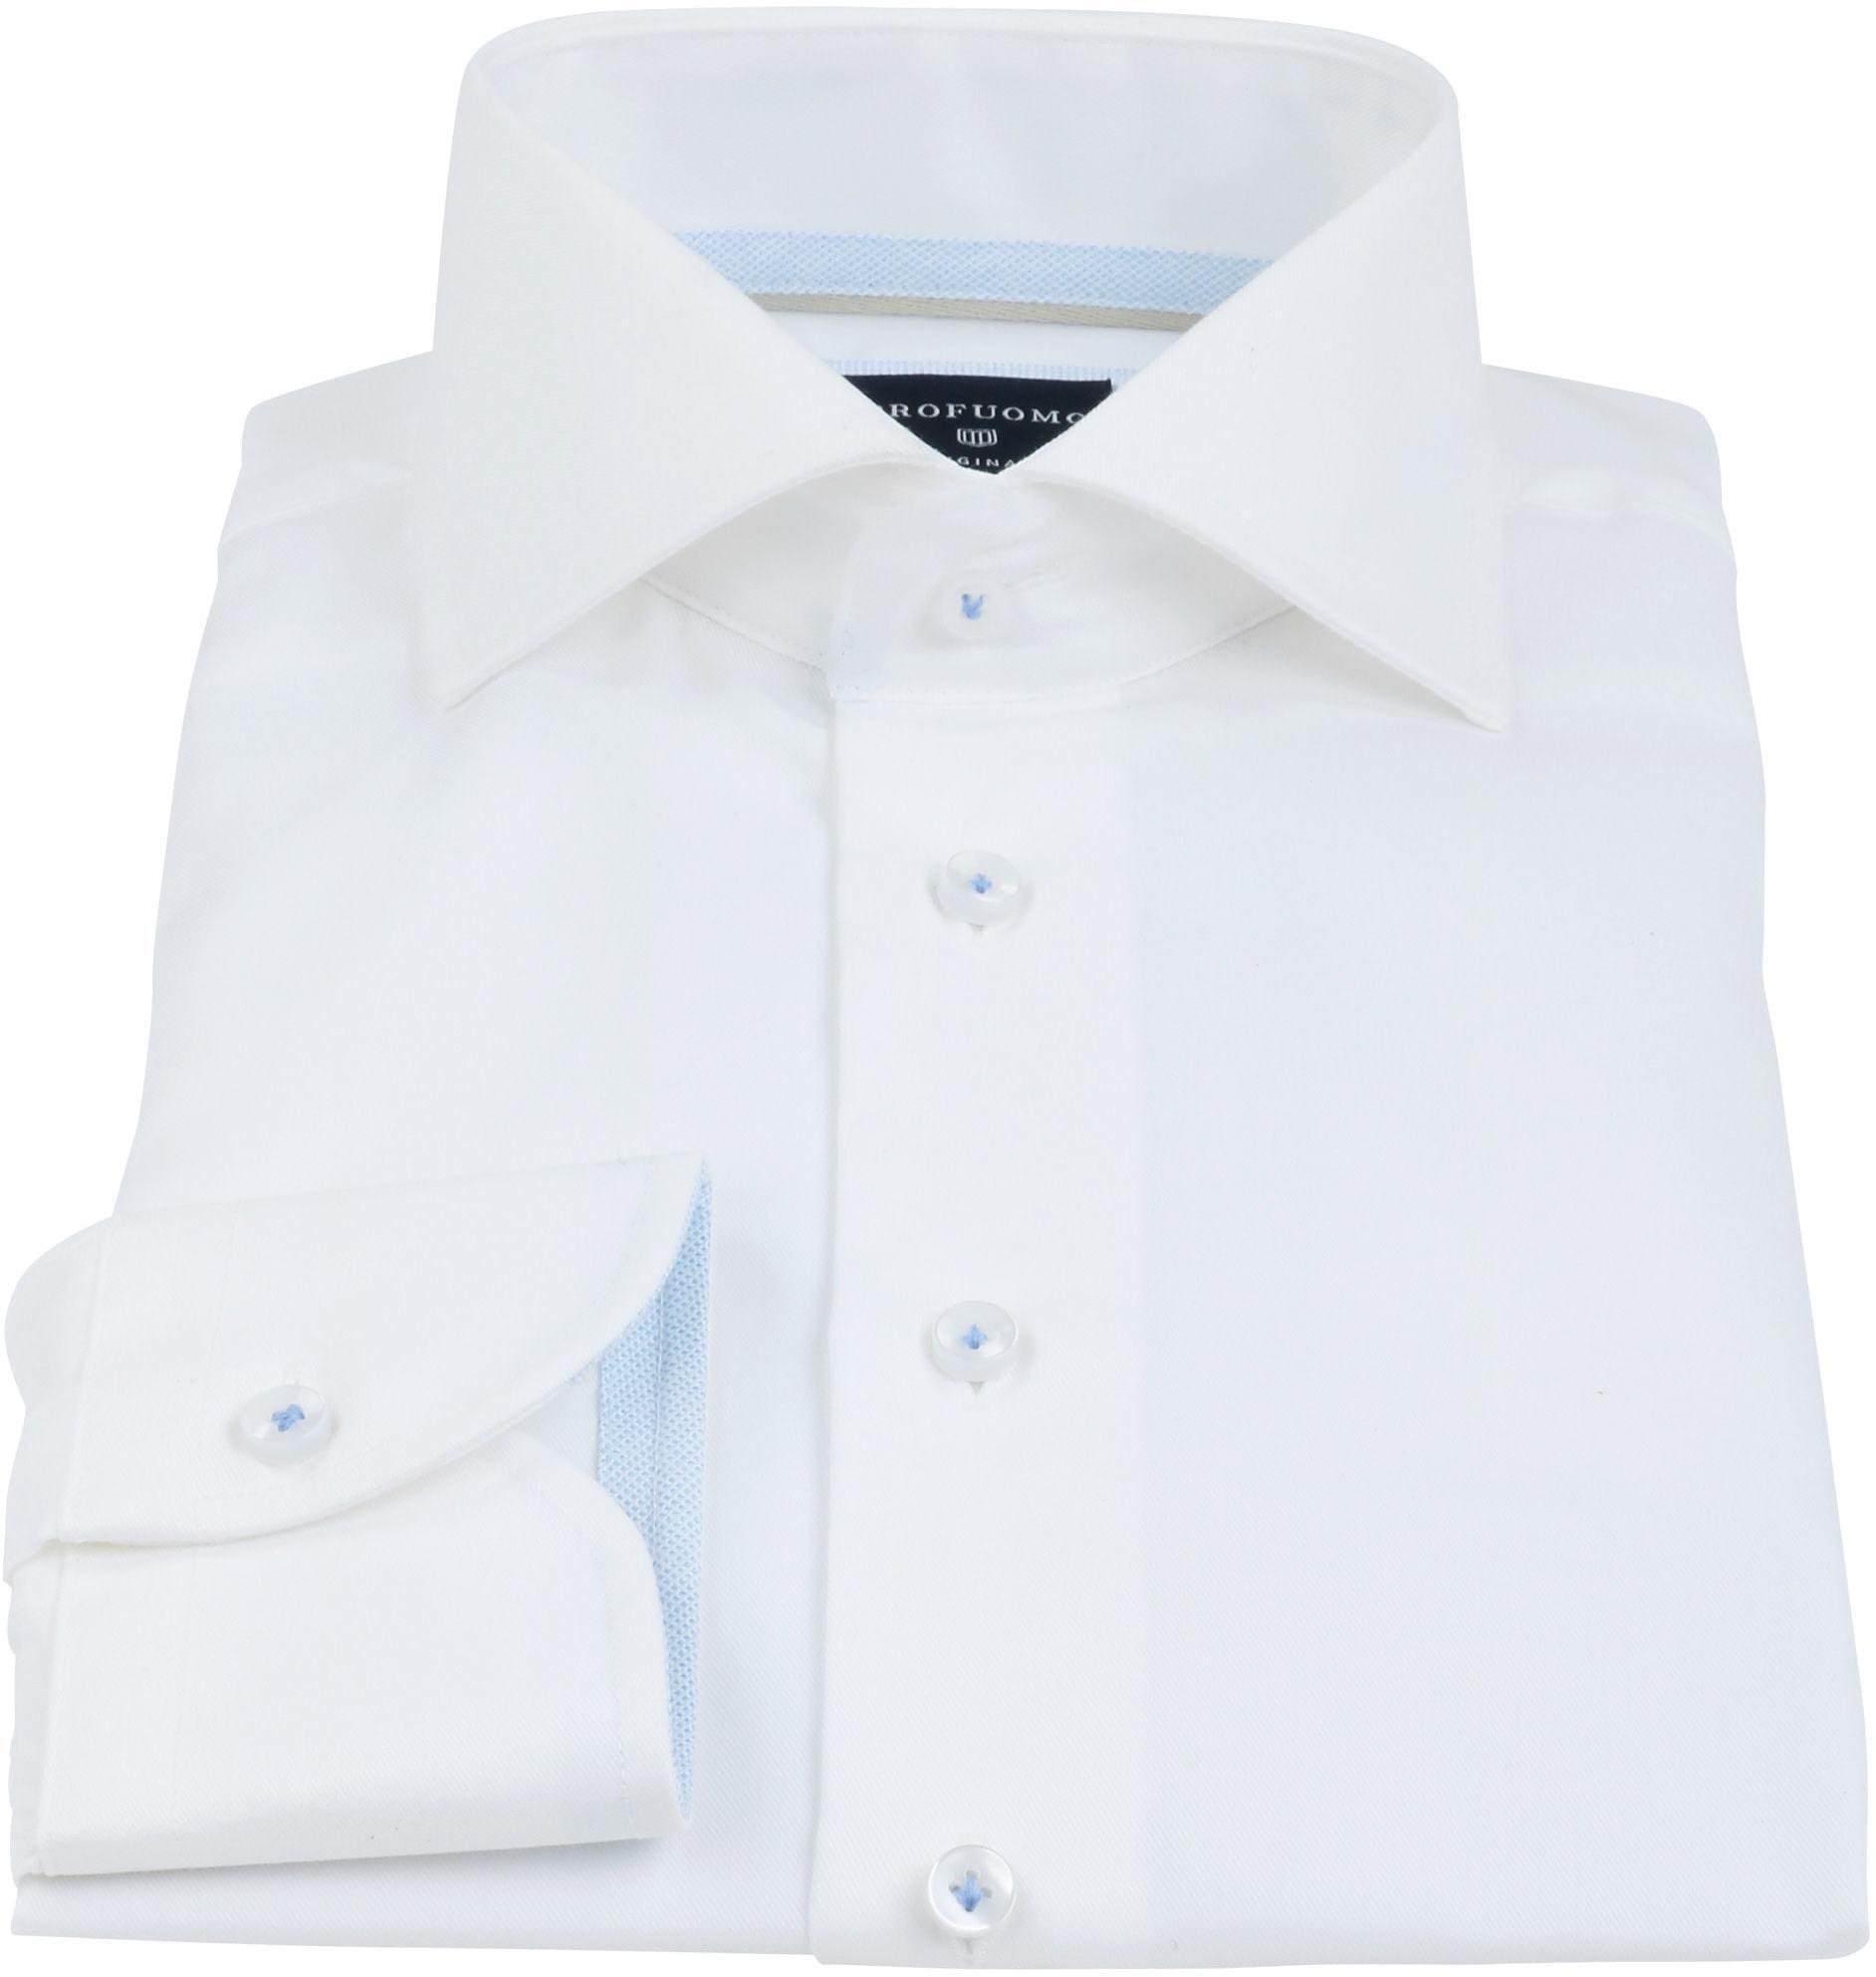 Profuomo Overhemd Strijkvrij Wit Blauw foto 2